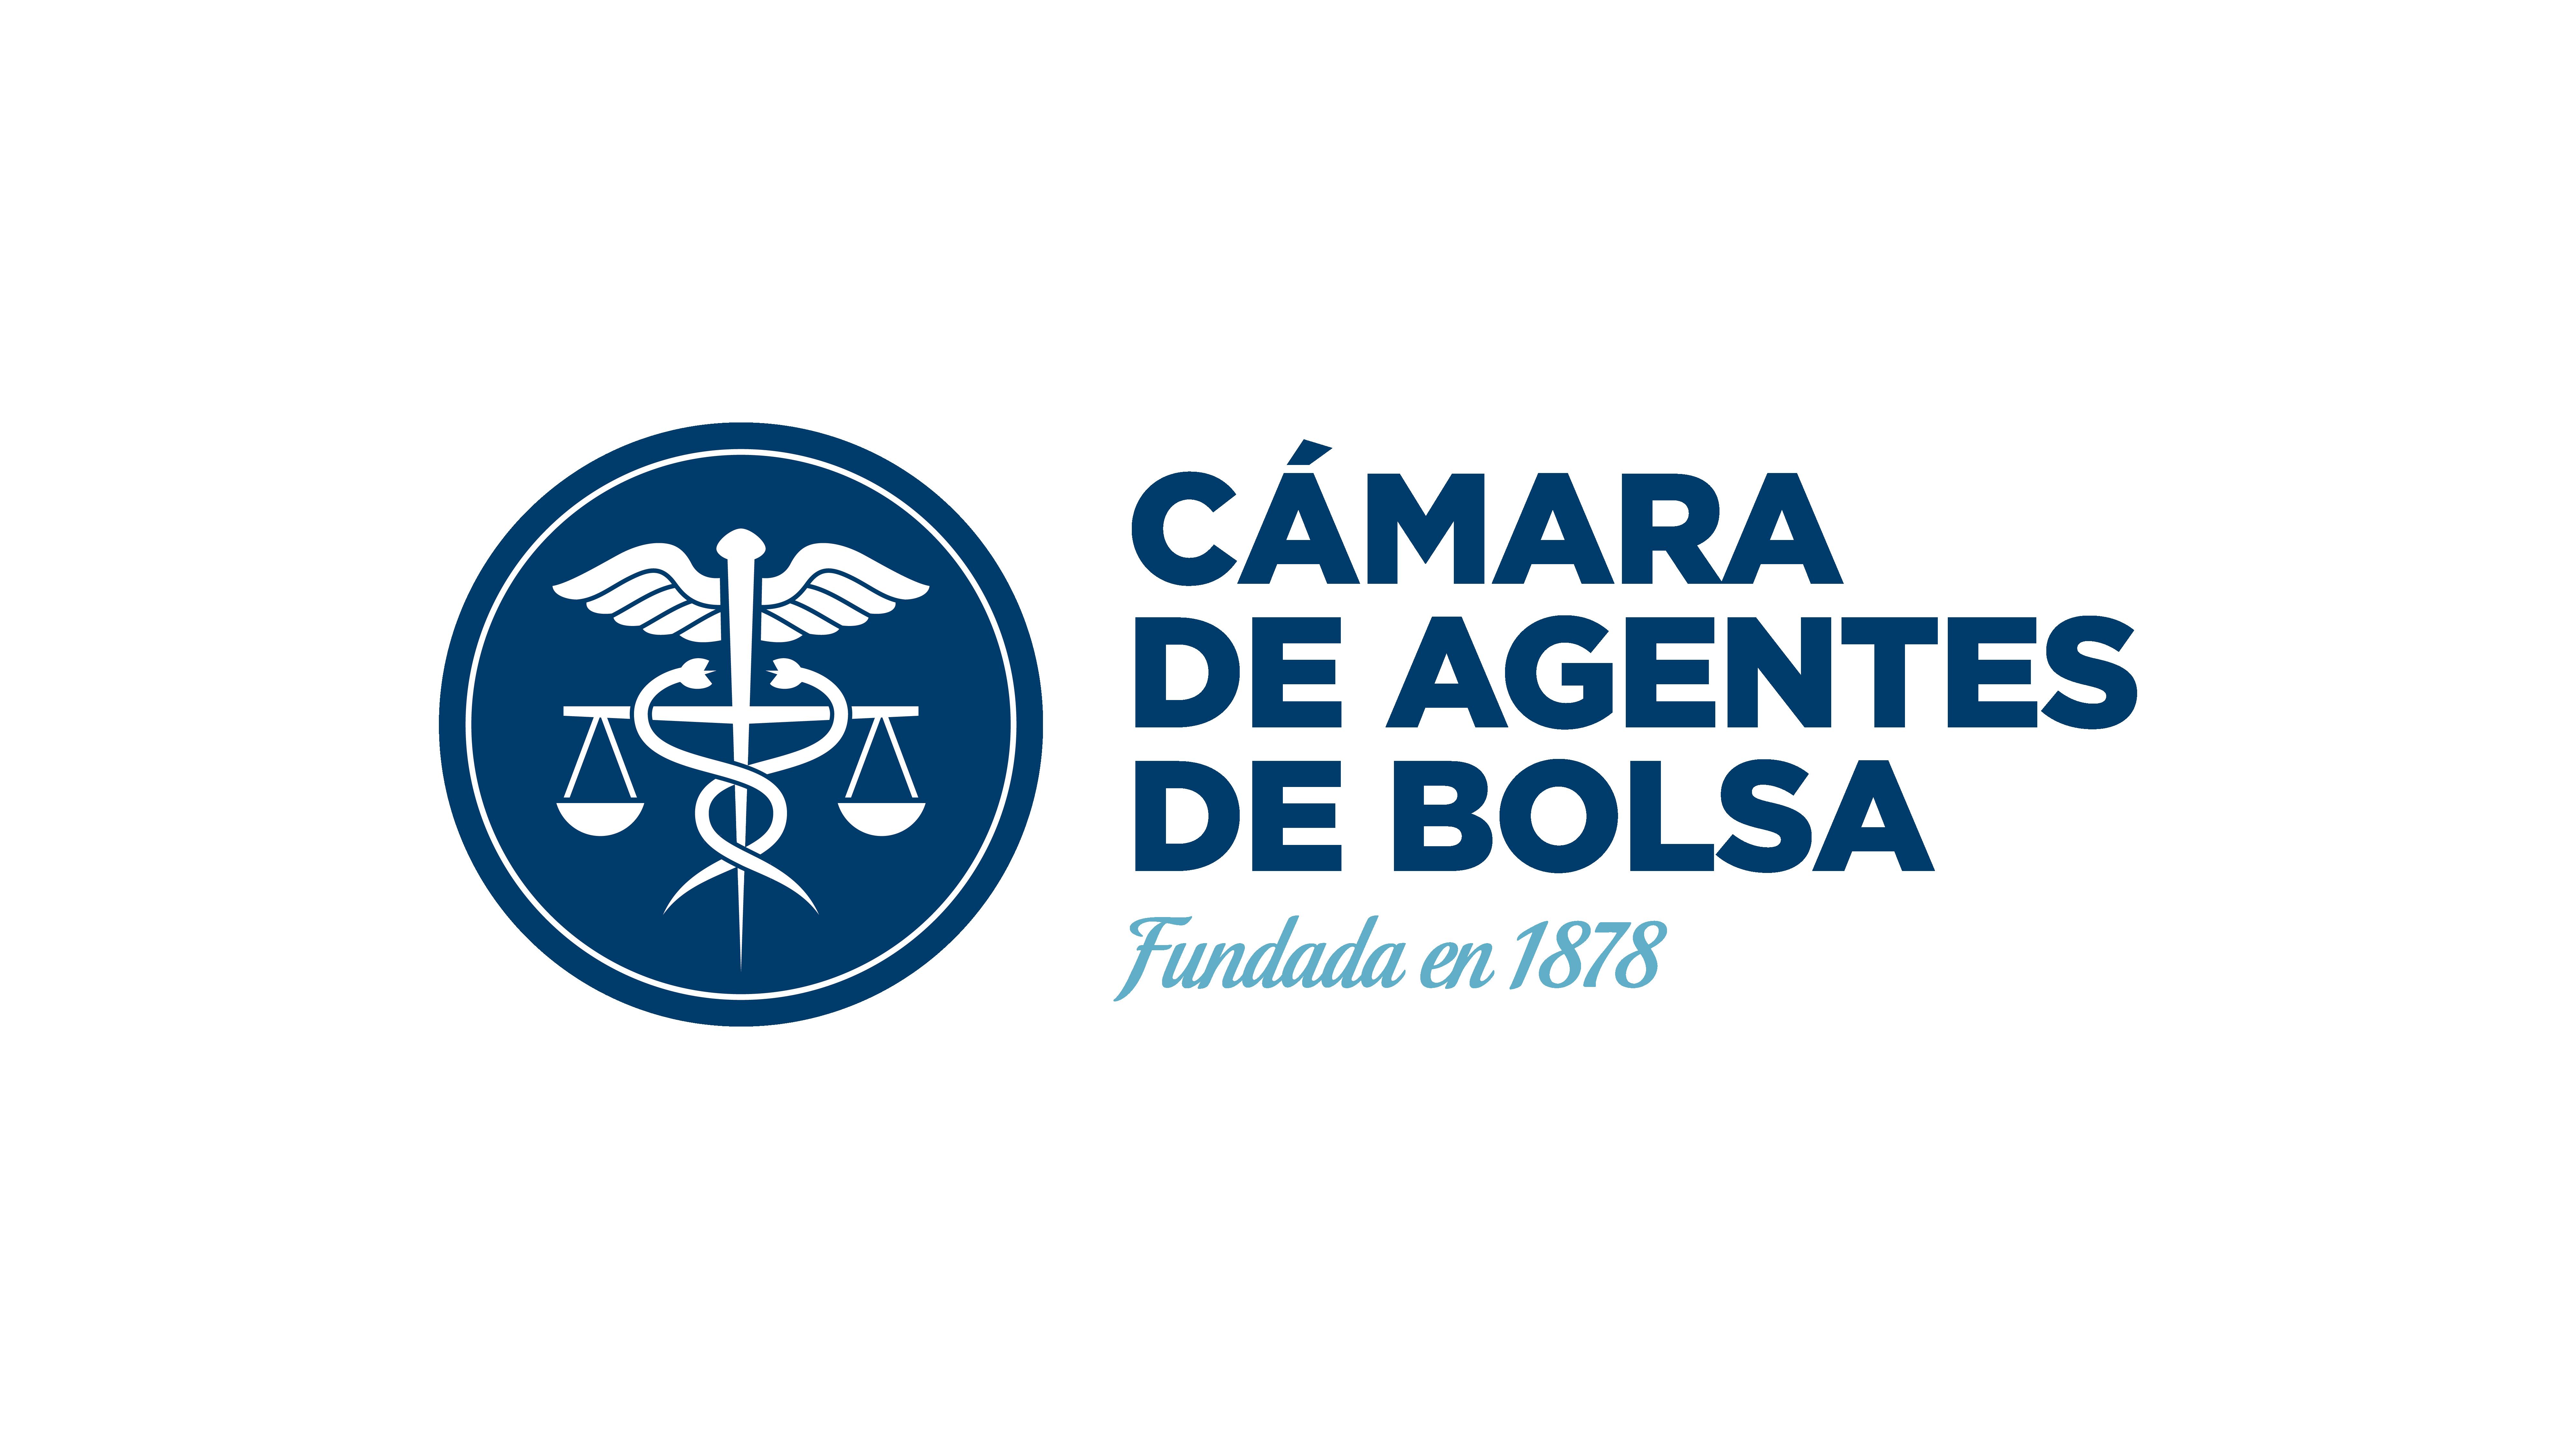 Camara_Fundada